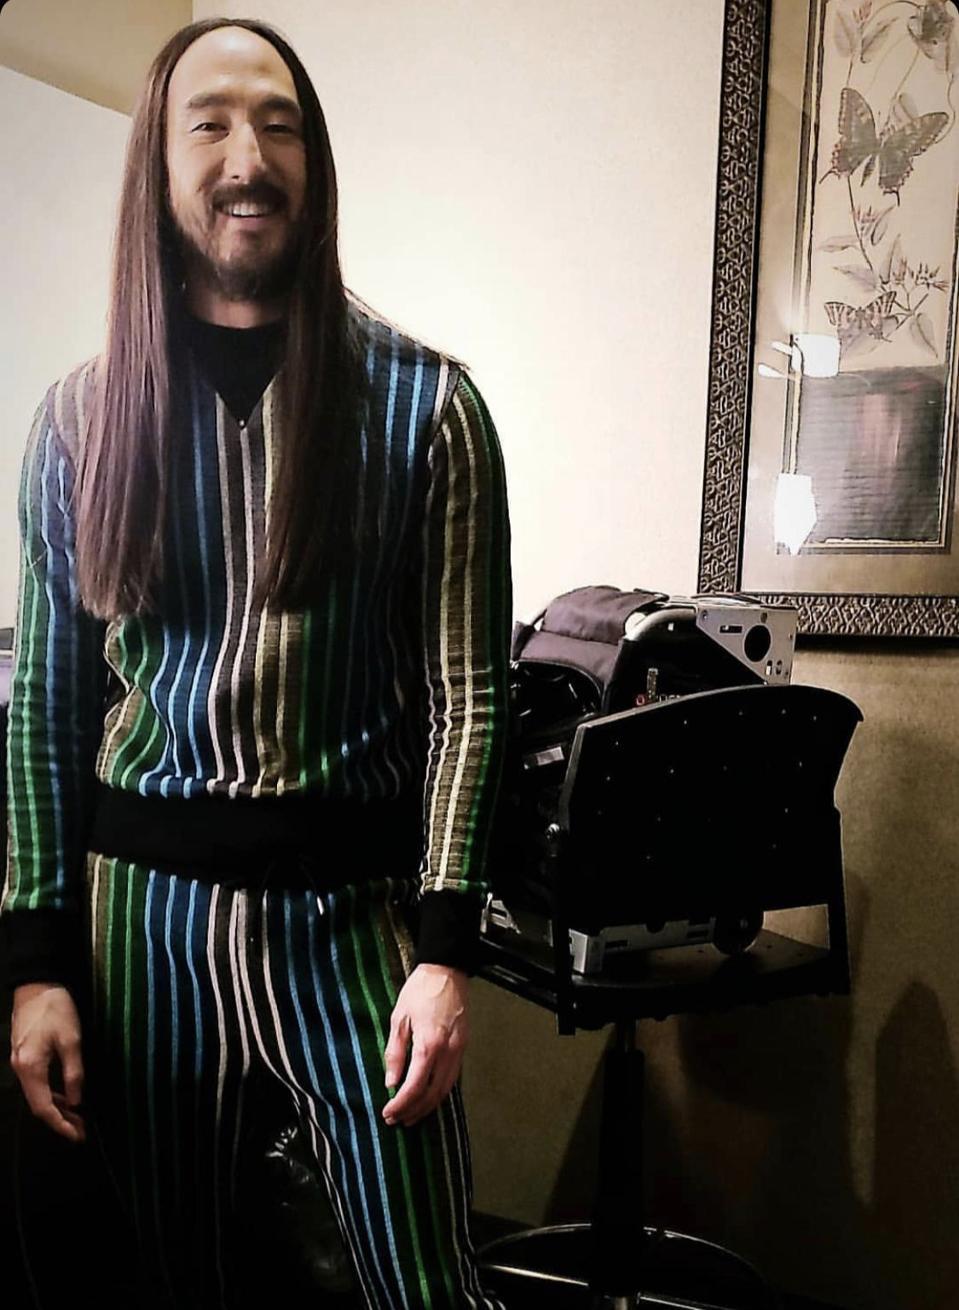 Muscian/DJ/RecordProducer/Music Executive-Steve Aoki wearing Joe Yellino